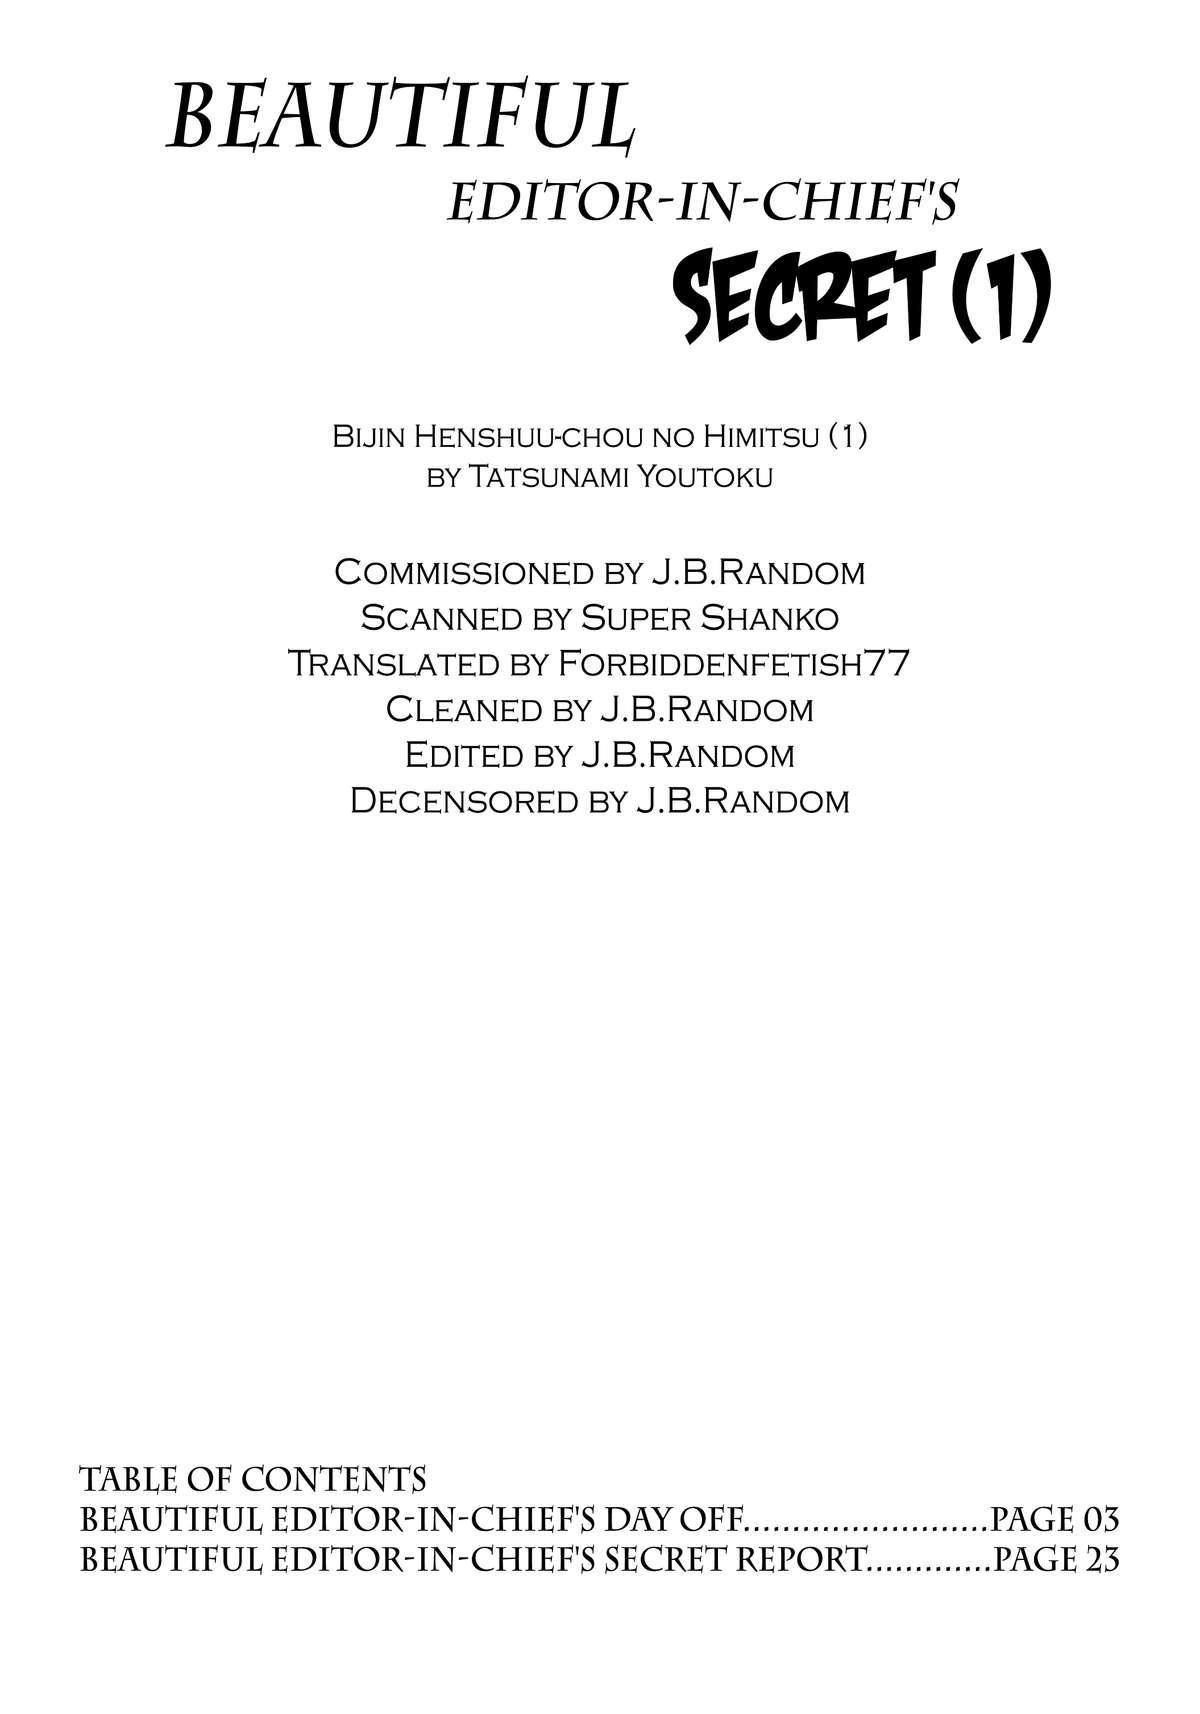 [Madam Project (Tatsunami Youtoku)] Bijin Henshuu-chou no Himitsu (1)   Beautiful Editor-in-Chief's Secret (1) [English] [Forbiddenfetish77] [Decensored] 1